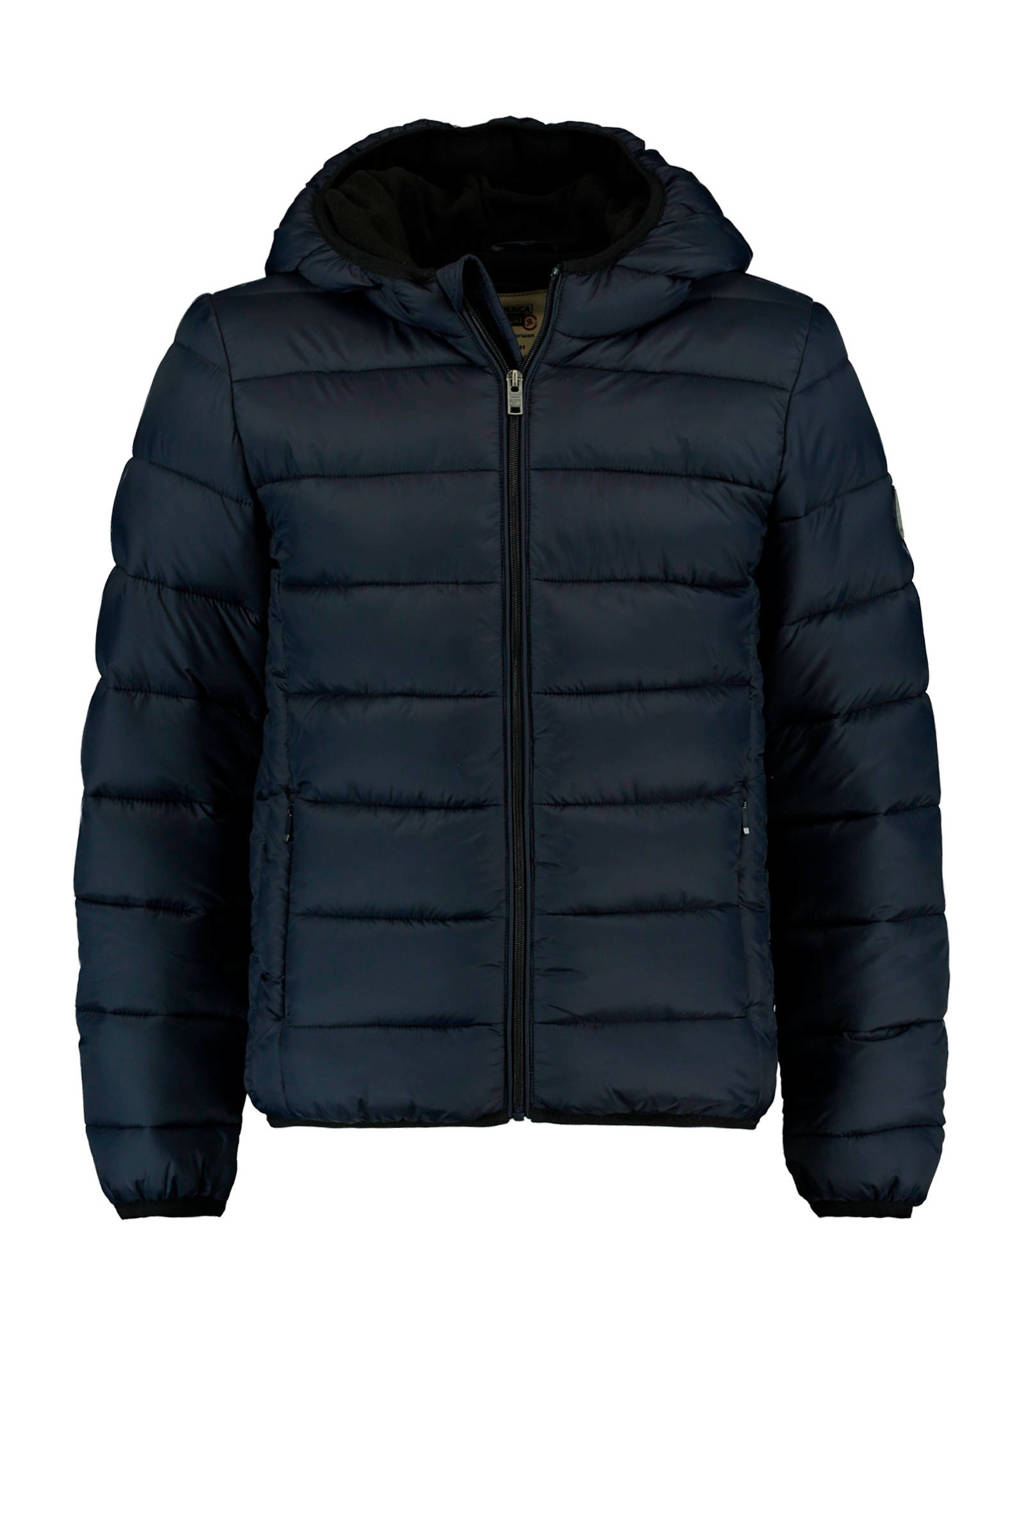 America Today Junior winterjas donkerblauw Jeremy, Antraciet